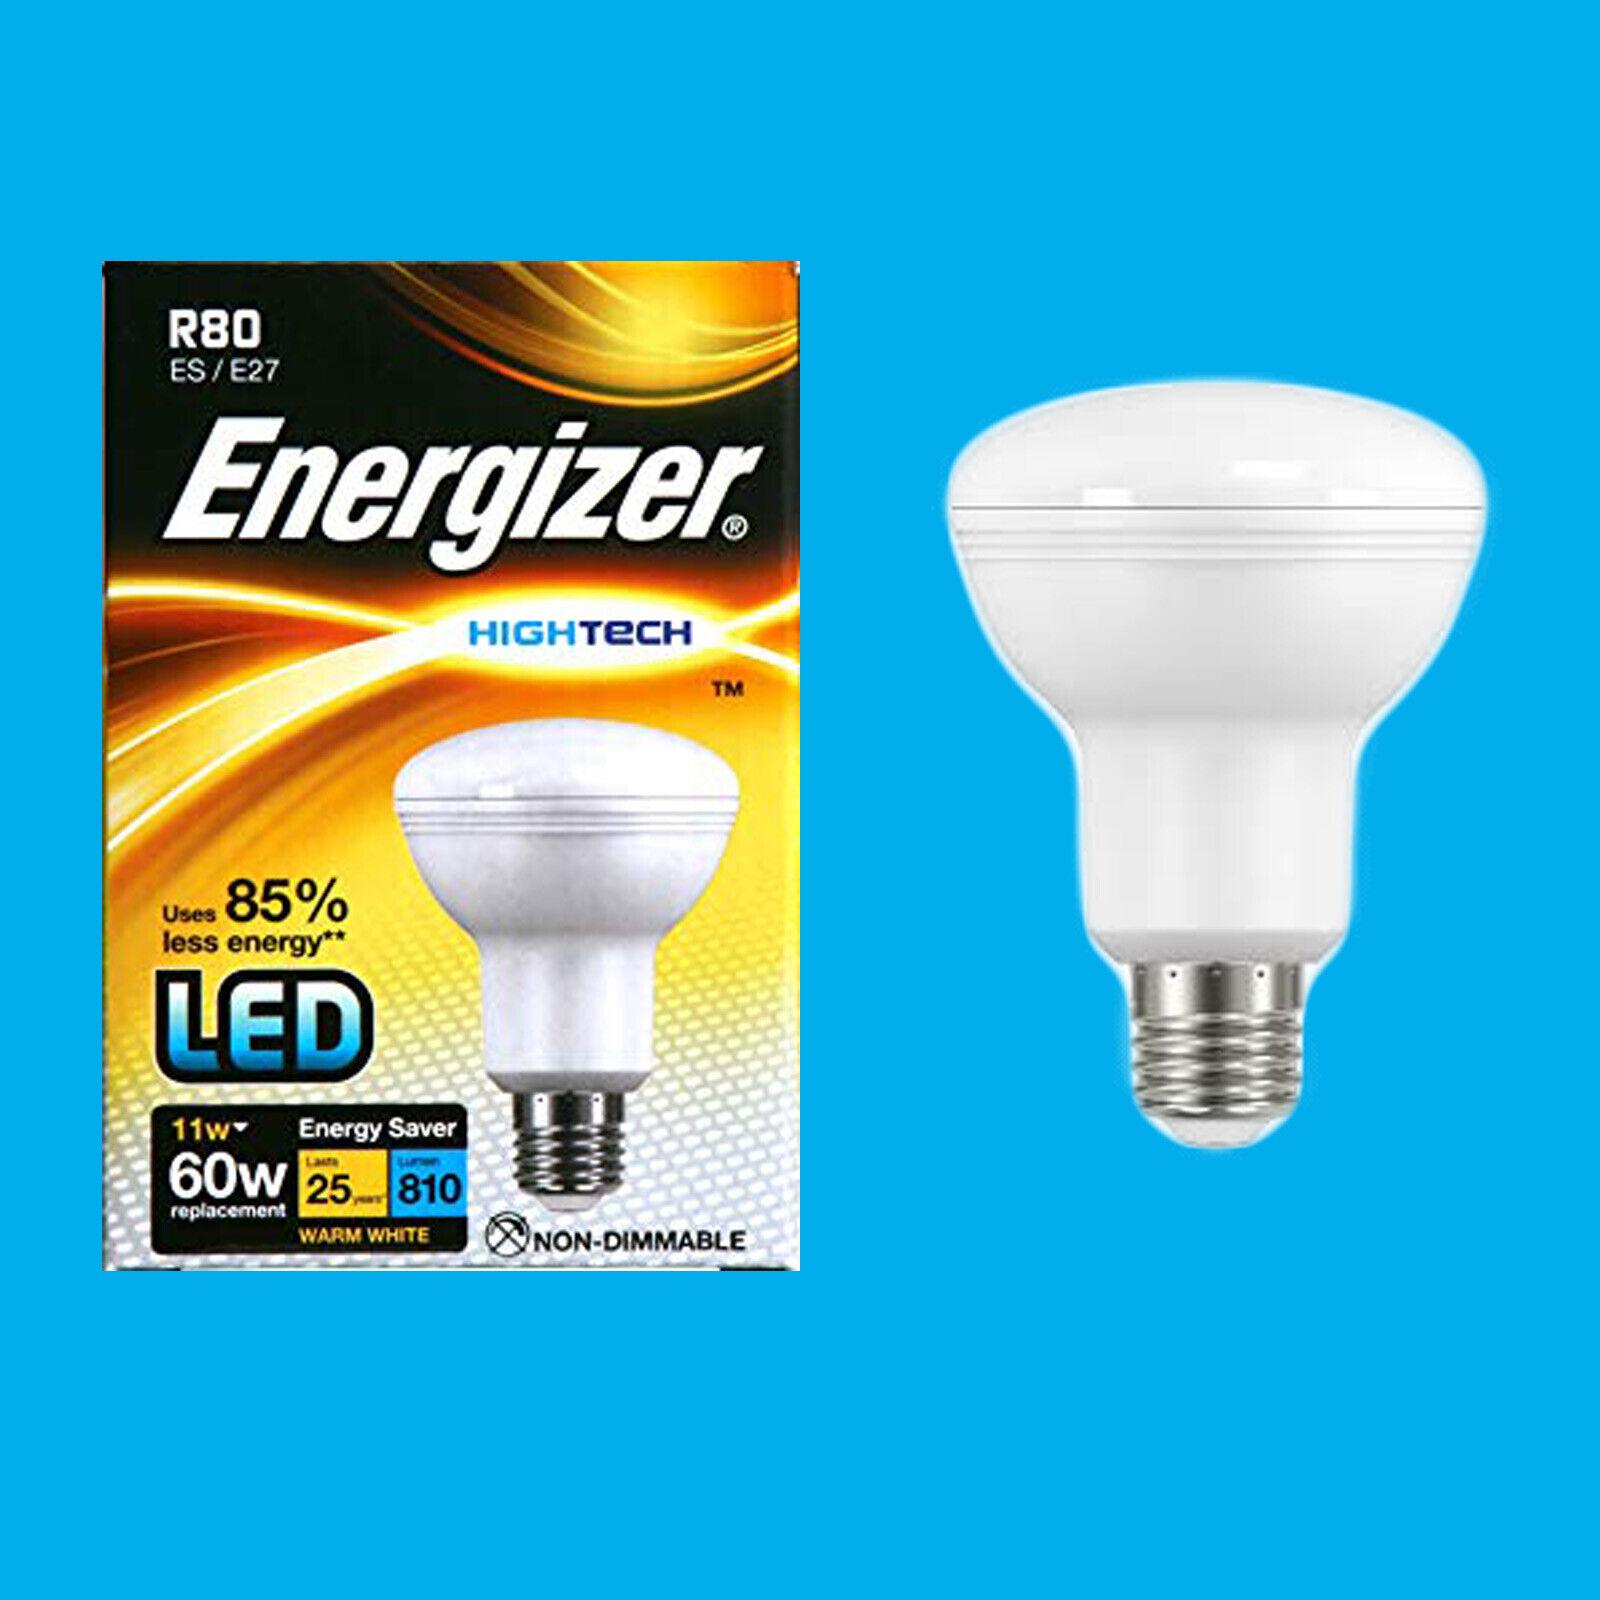 8x 11W R80 810lm LED Ultra Low Energy Reflector Spotlight Bulb ES E27 Light Lamp